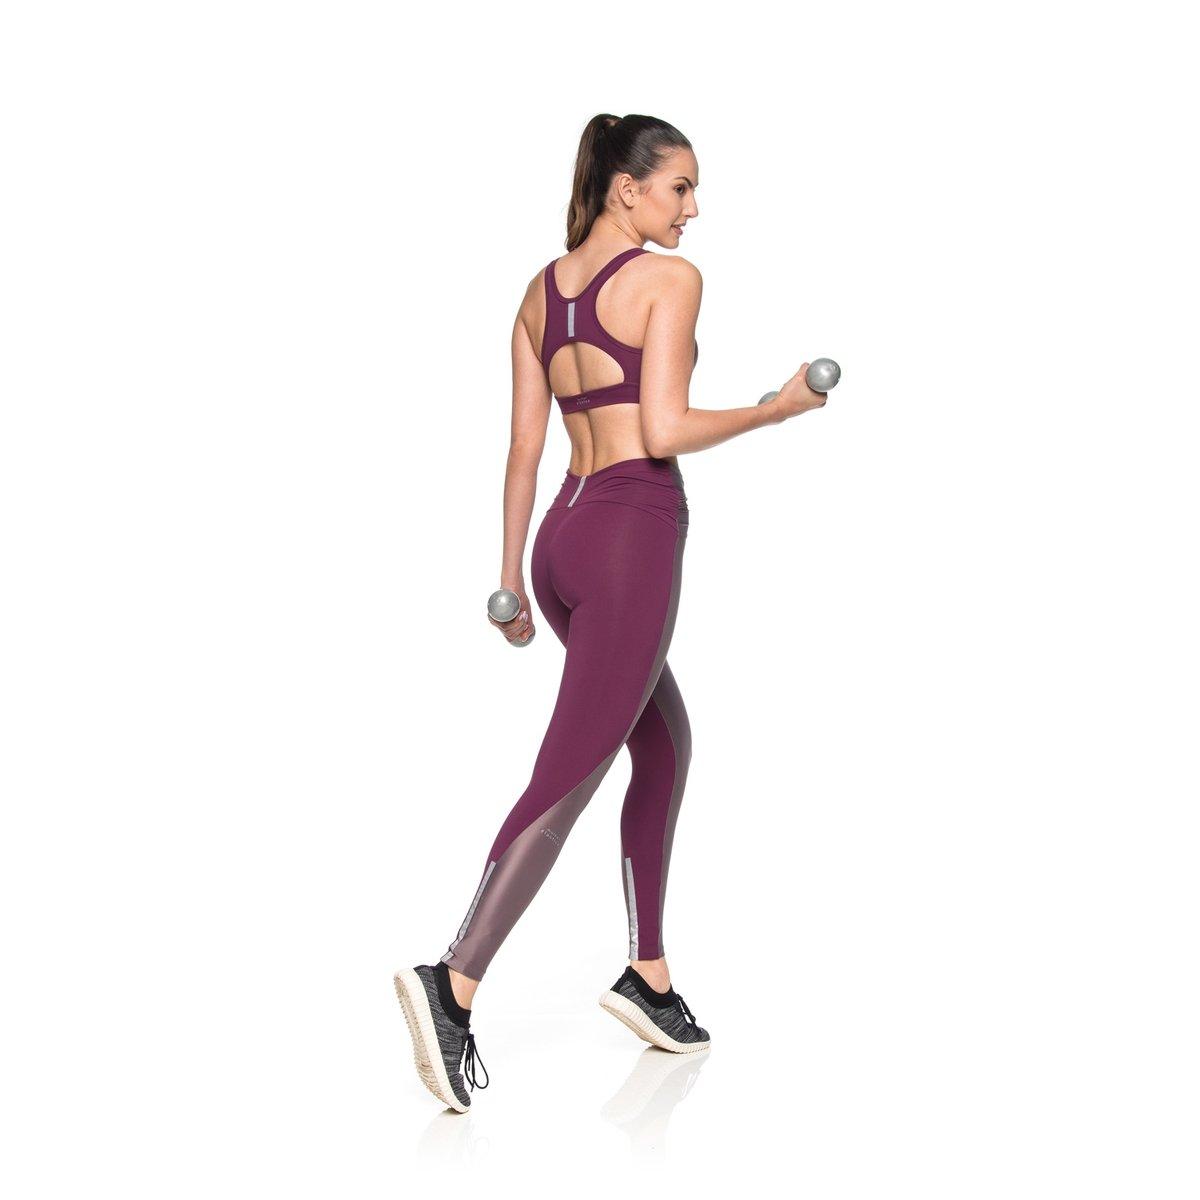 Reflect Top Fitness Fitness Bordô Top Zíper IwwRq